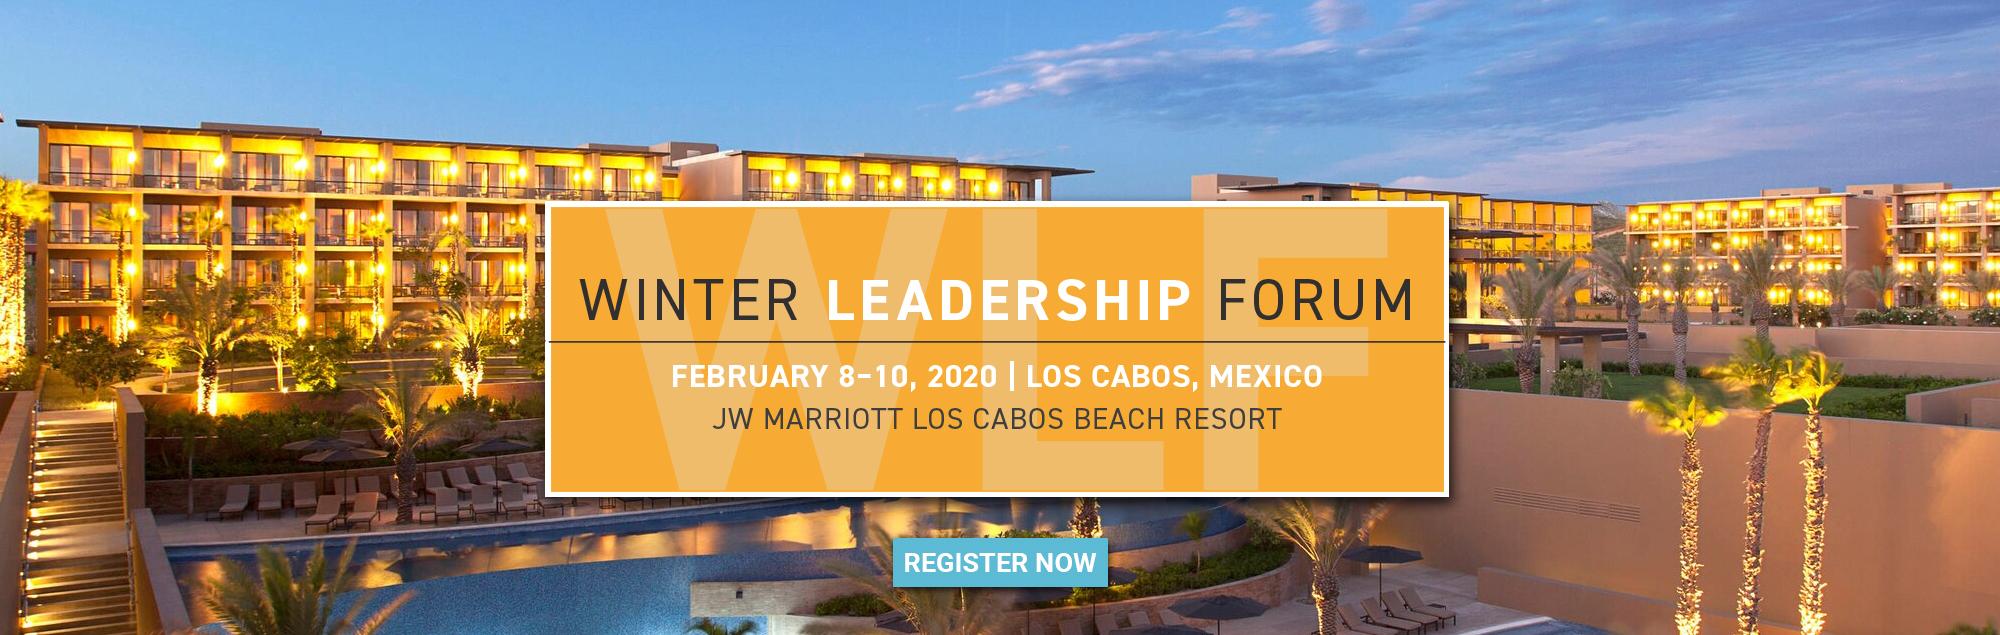 Winter Leadership Forum